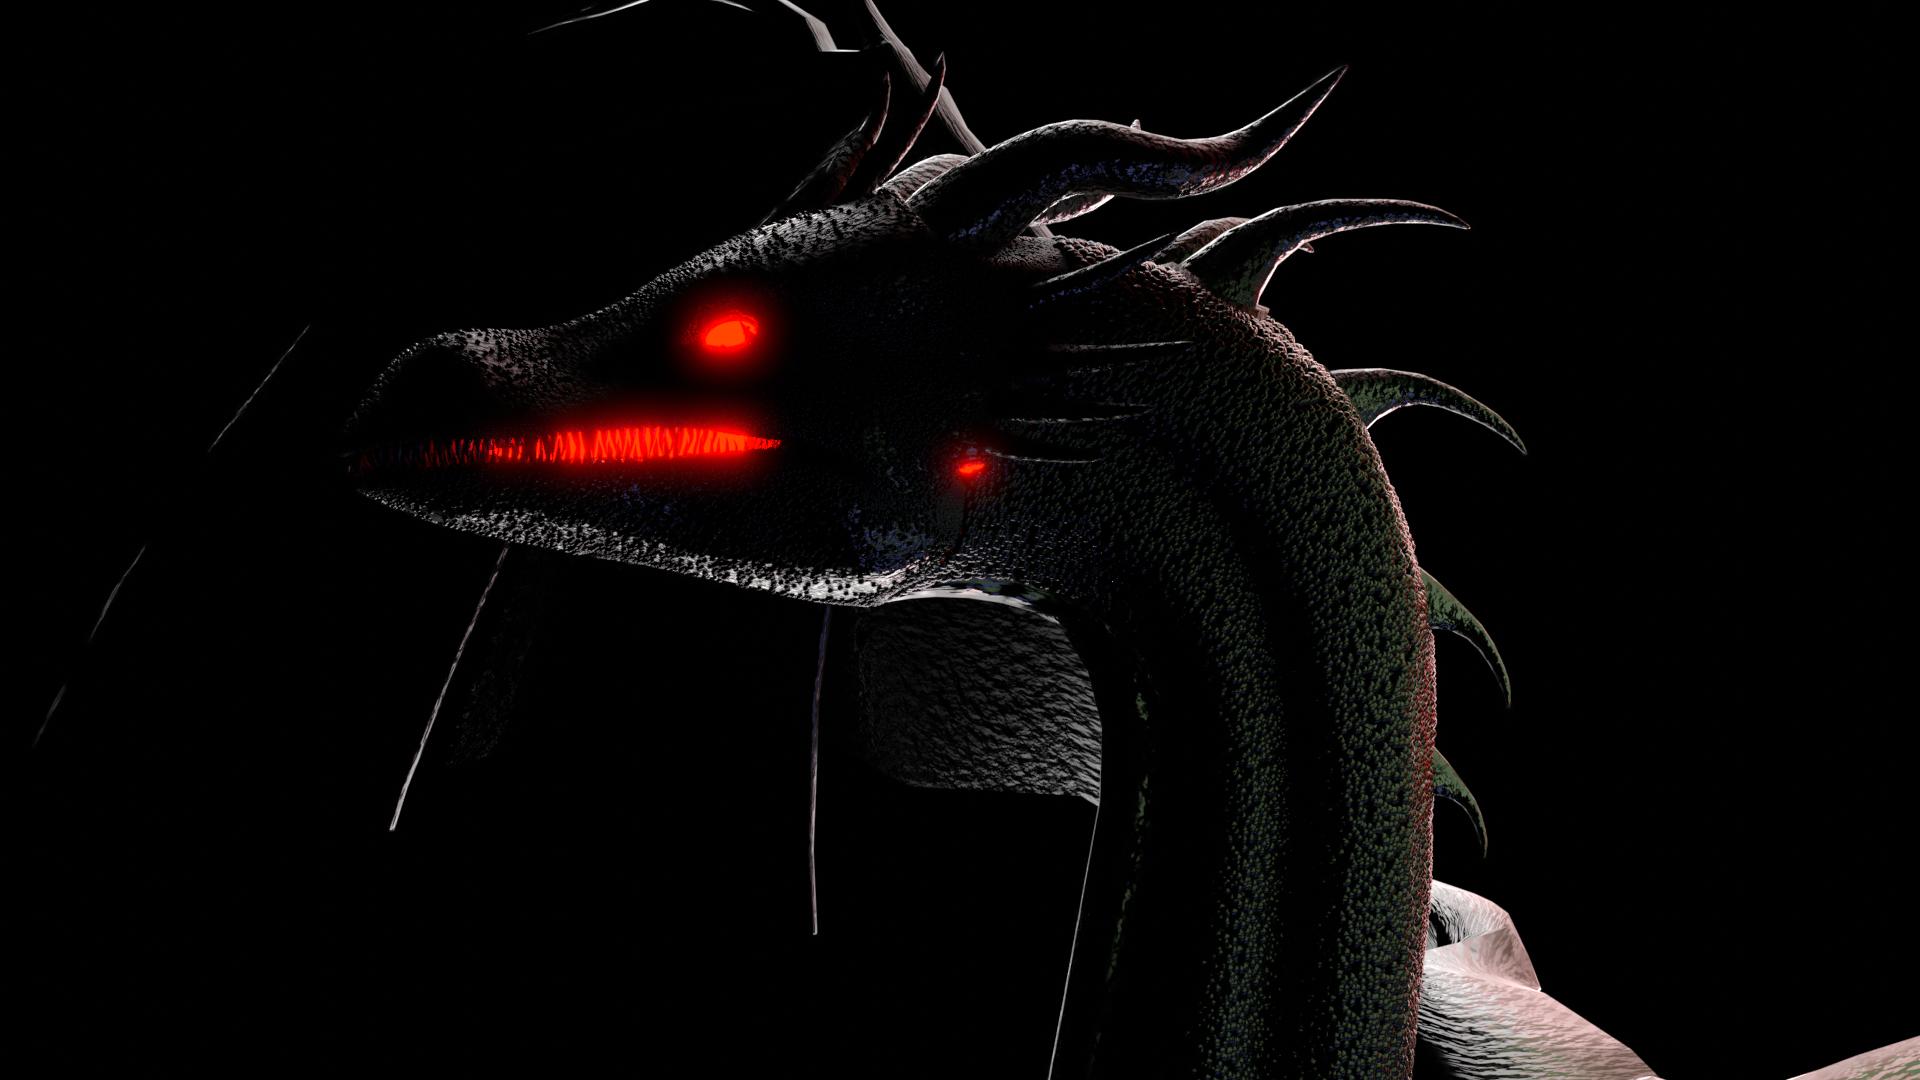 character in Dark Swarm